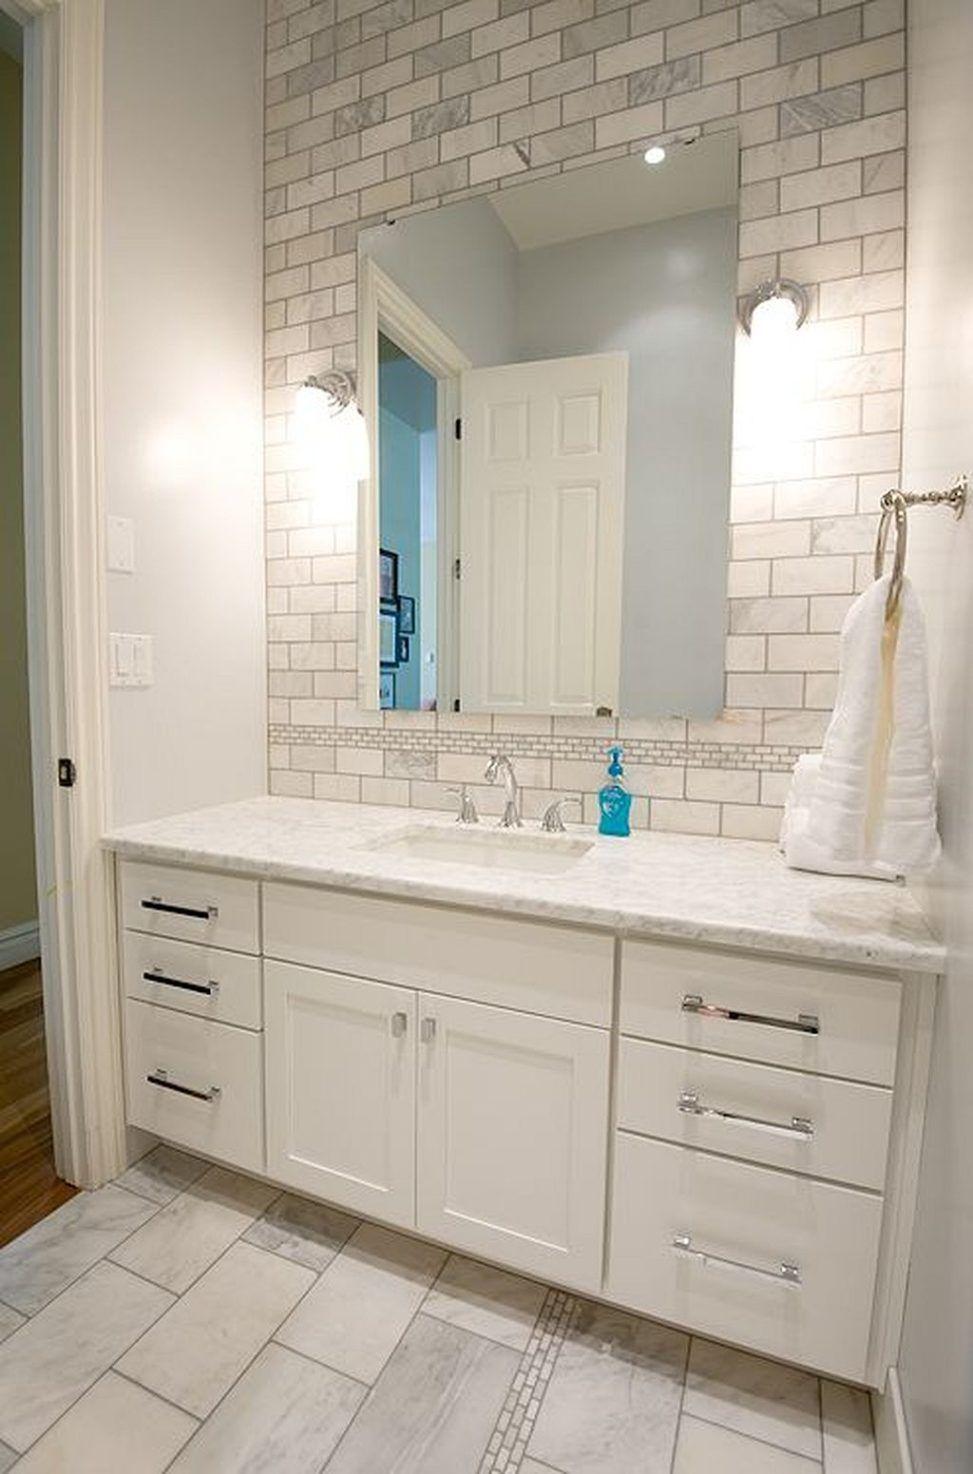 - Classy Subway Tile Backsplash For Kitchen Or Bathroom (14) (With